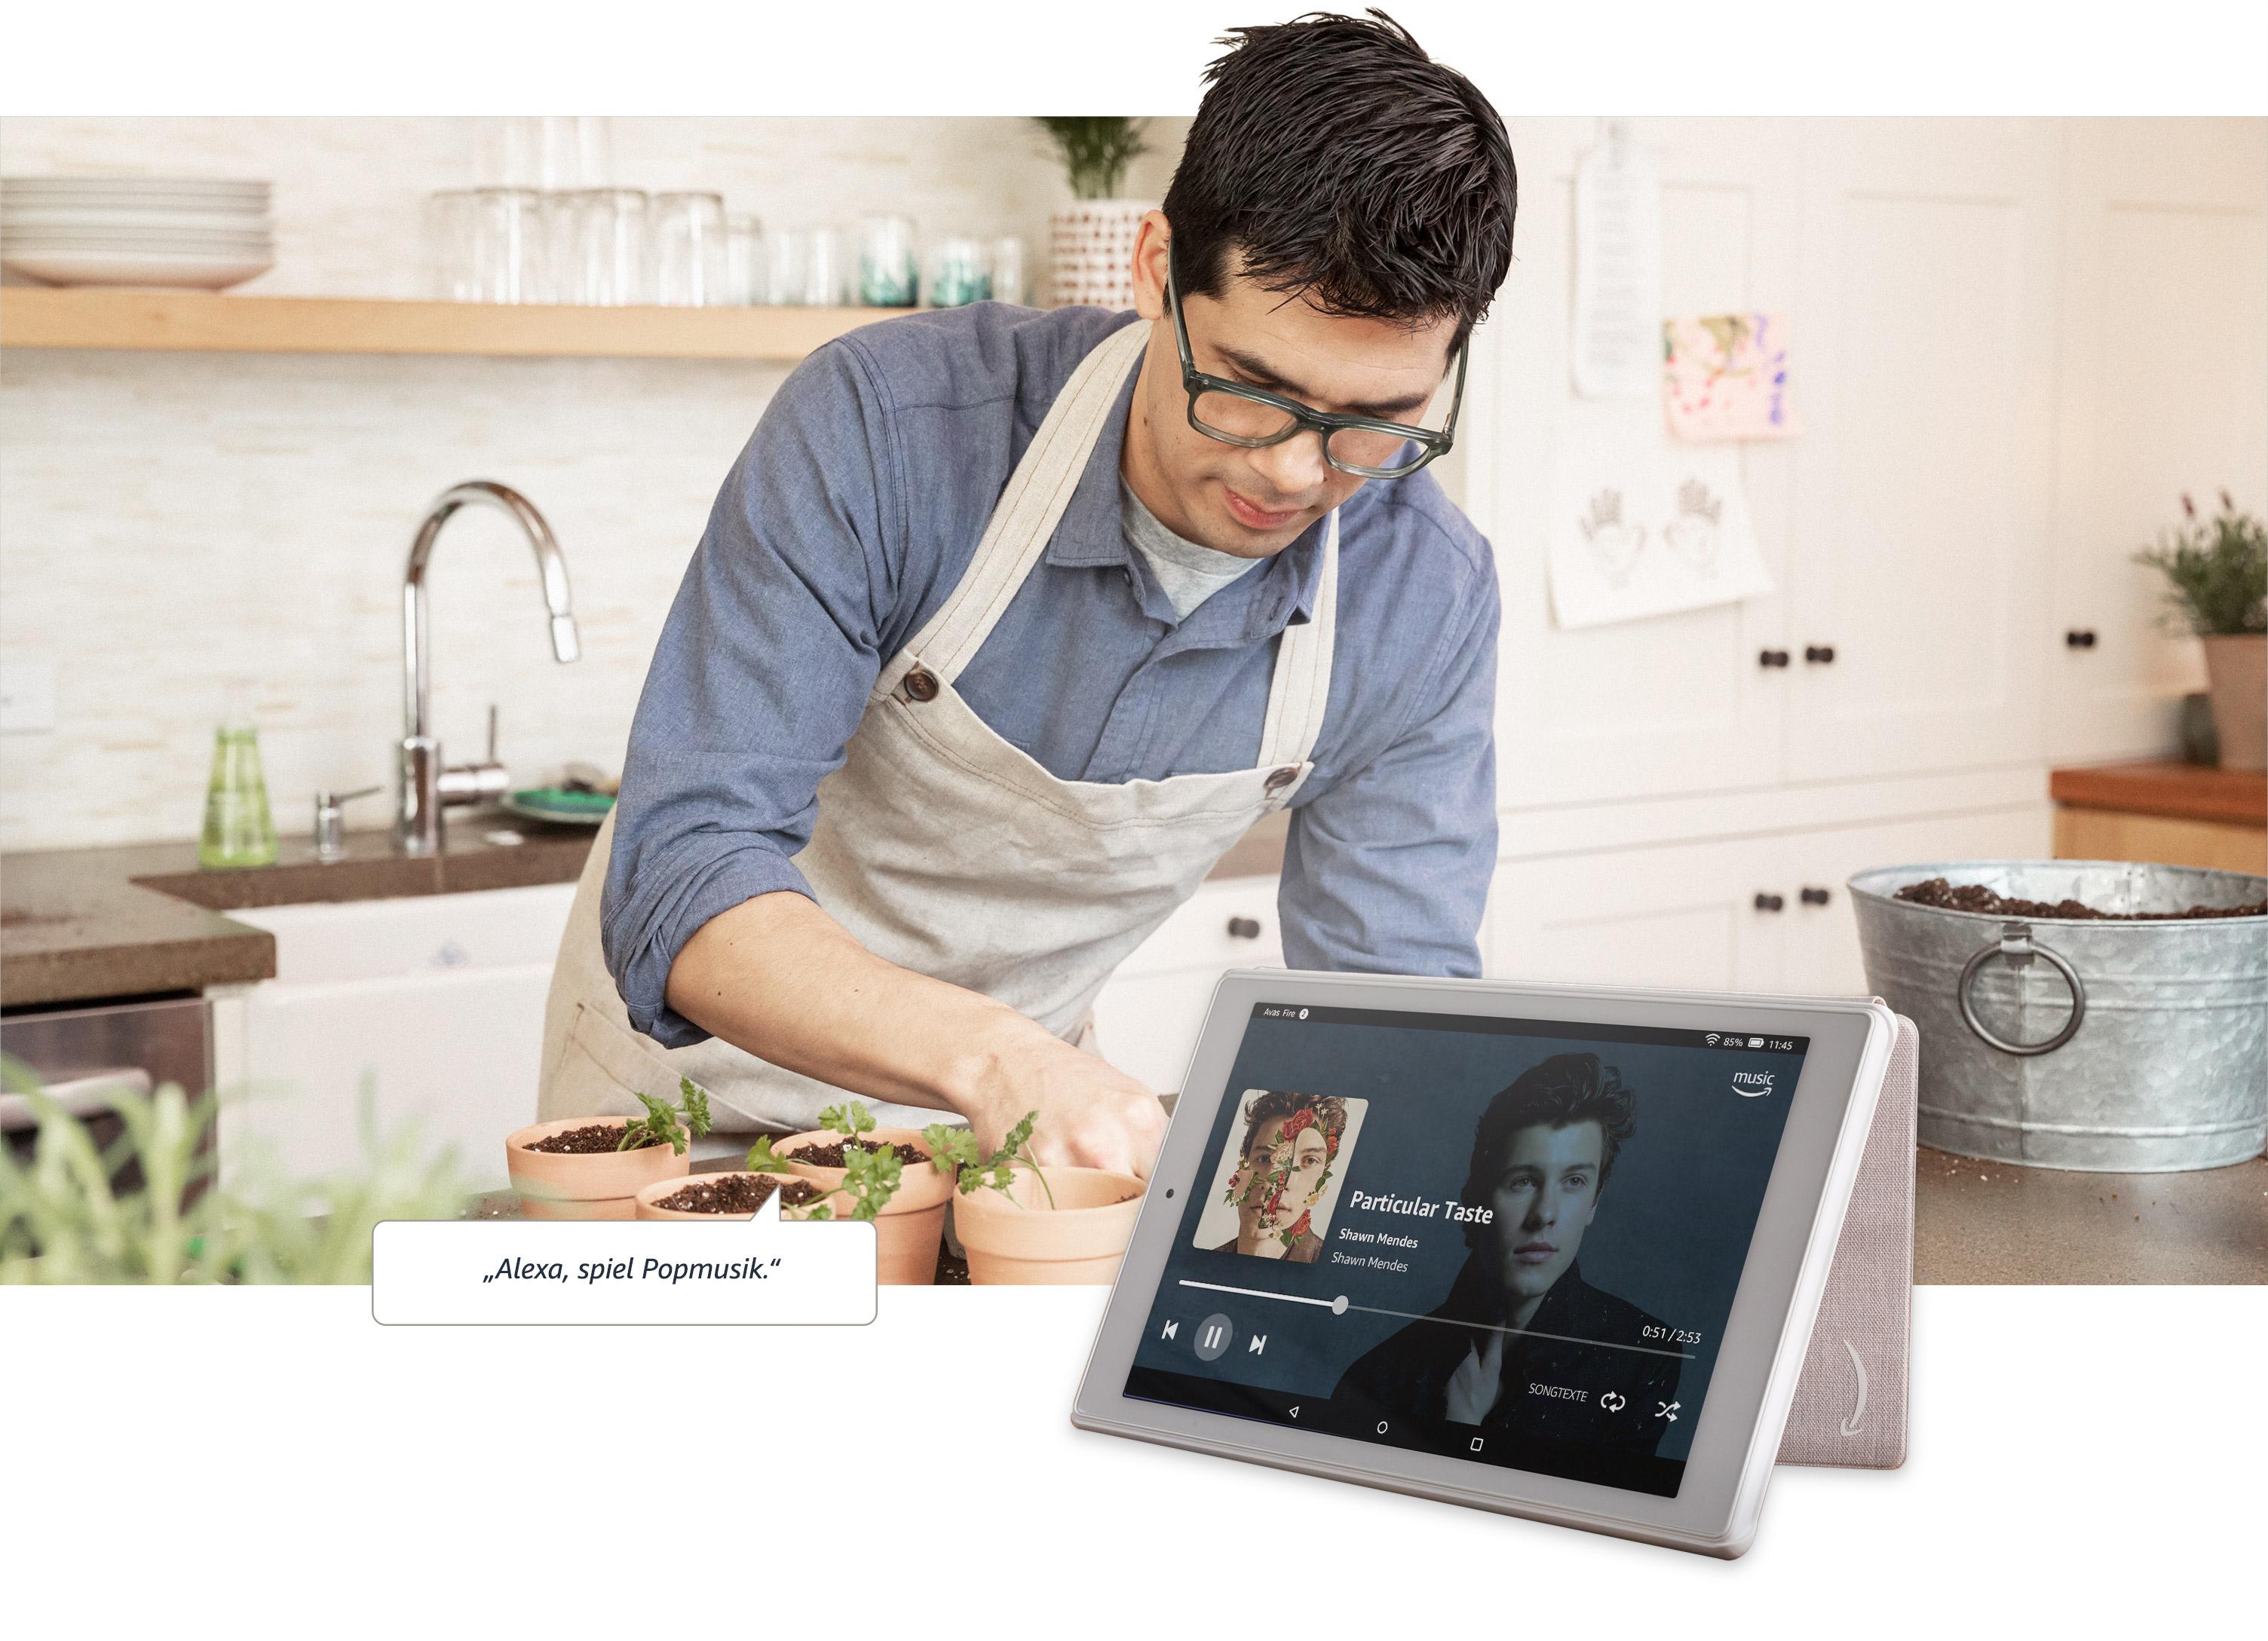 Fire Hd 10 Tablet 10 1 Zoll Großes Full Hd Display 1080p 32 Gb Schwarz Mit Werbung Vorherige Generation 9 Amazon Devices